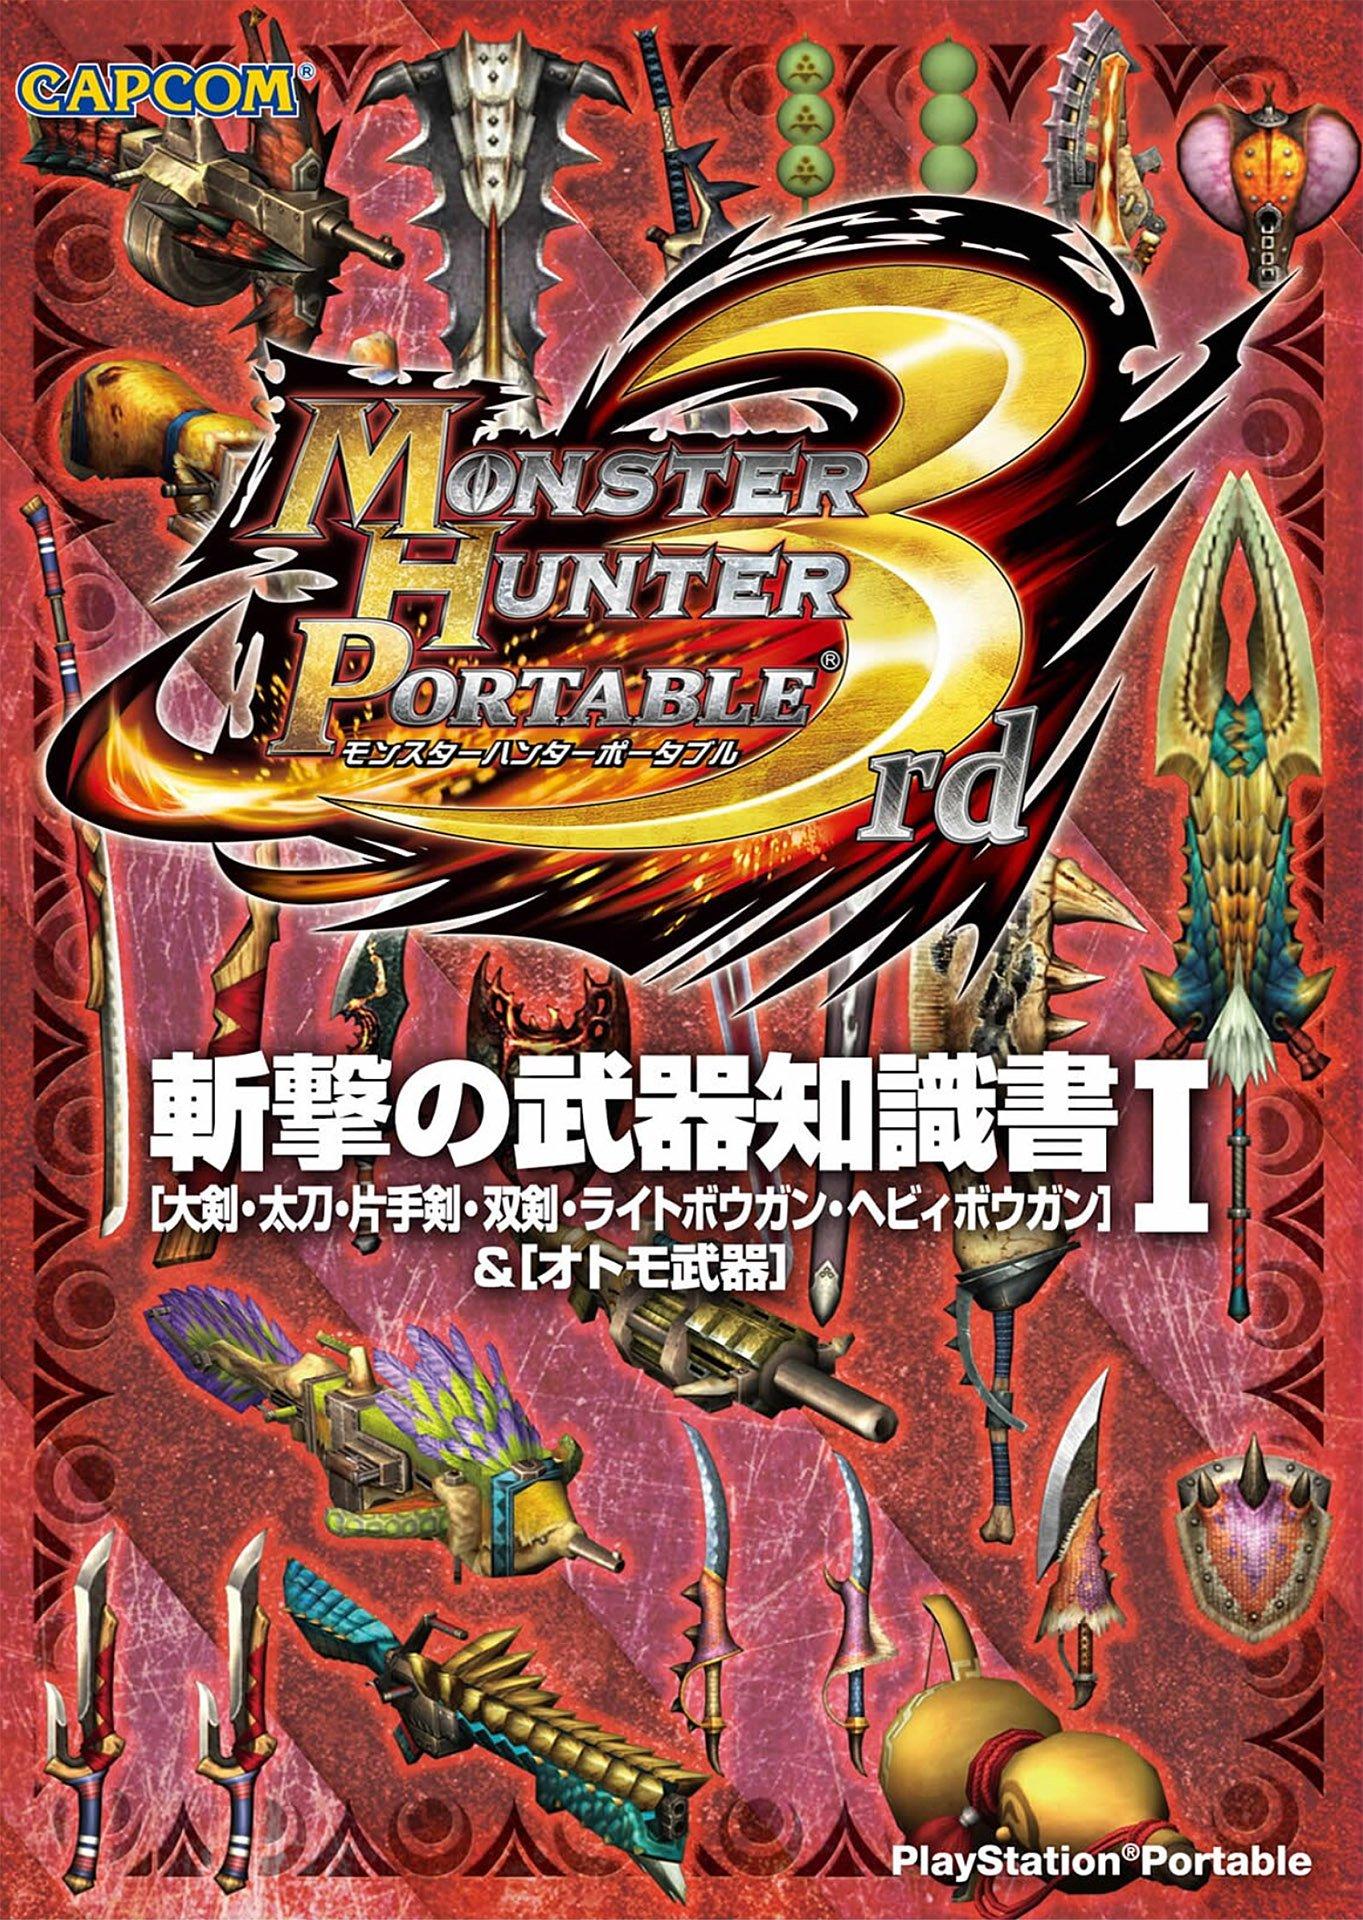 Monster Hunter Portable 3rd - Zangeki no buki chishiki-sho Vol.1